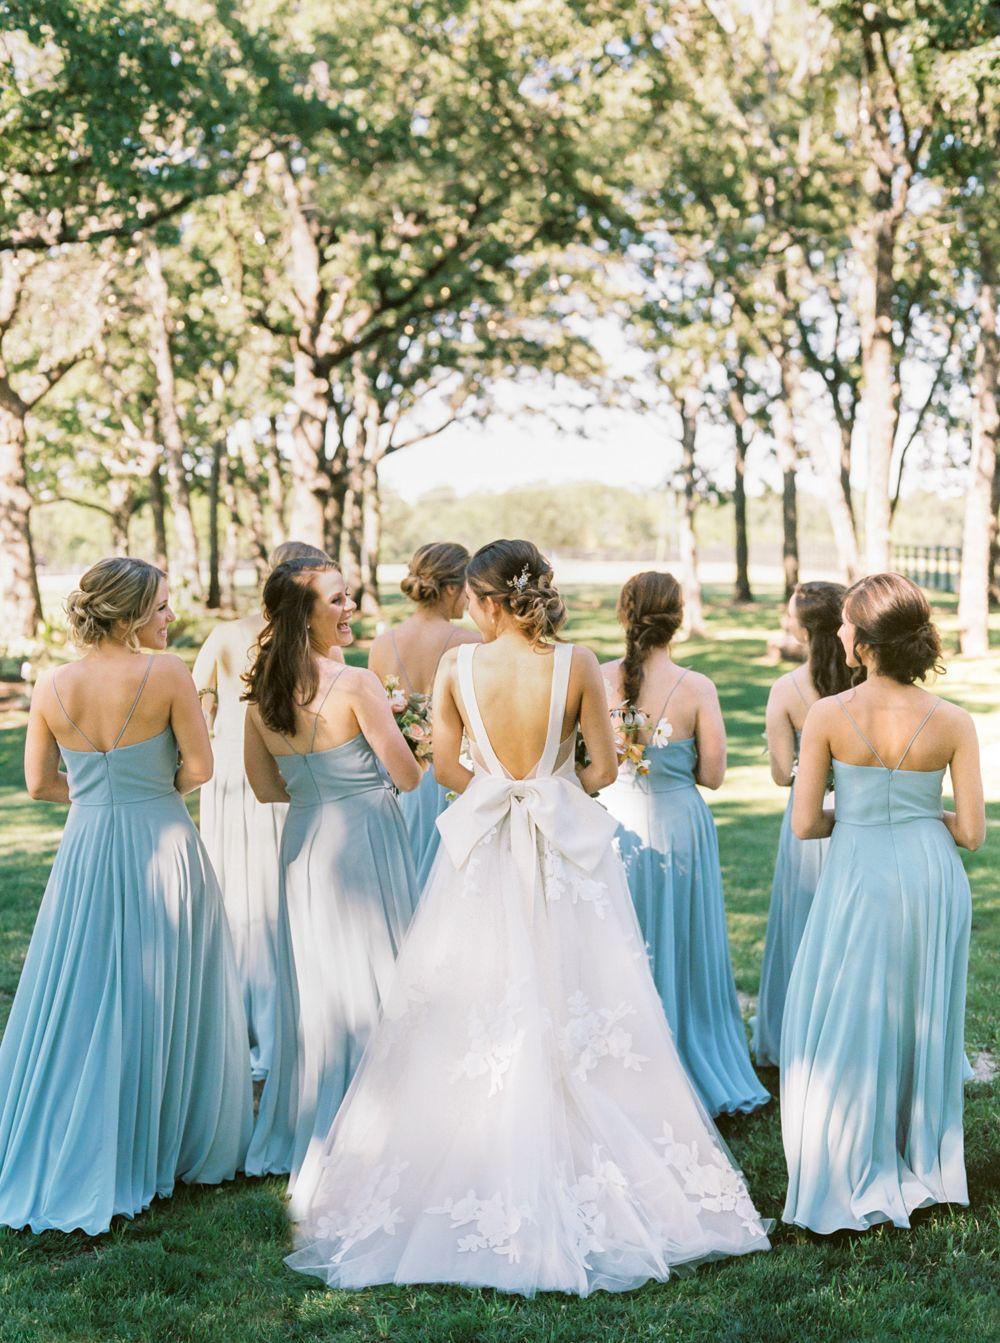 Blue bridesmaid dresses wedding dresses pinterest wedding